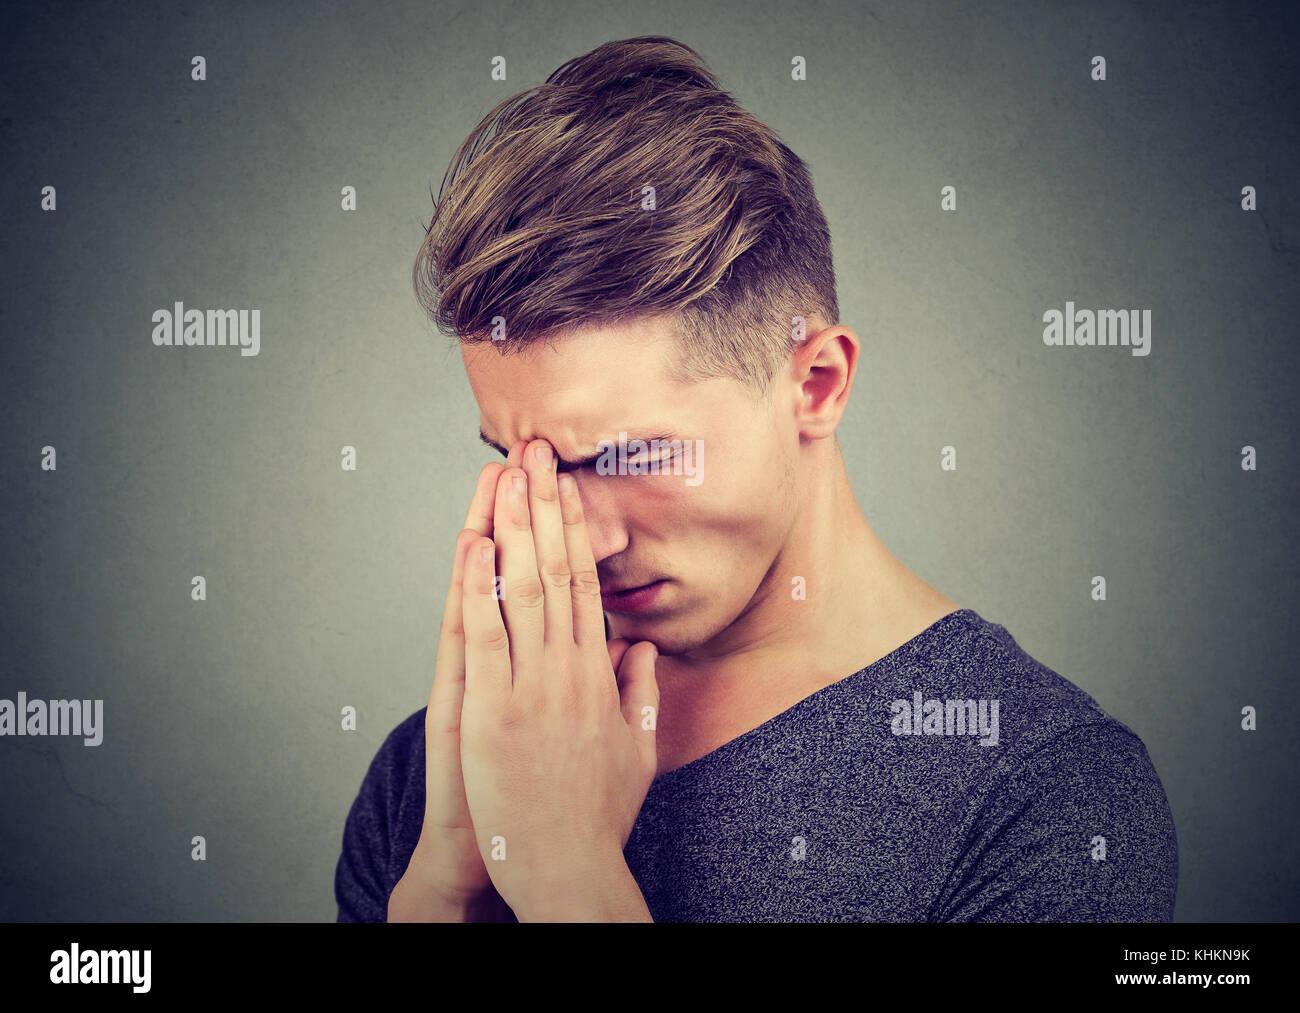 Sad man with tensed face expression praying - Stock Image